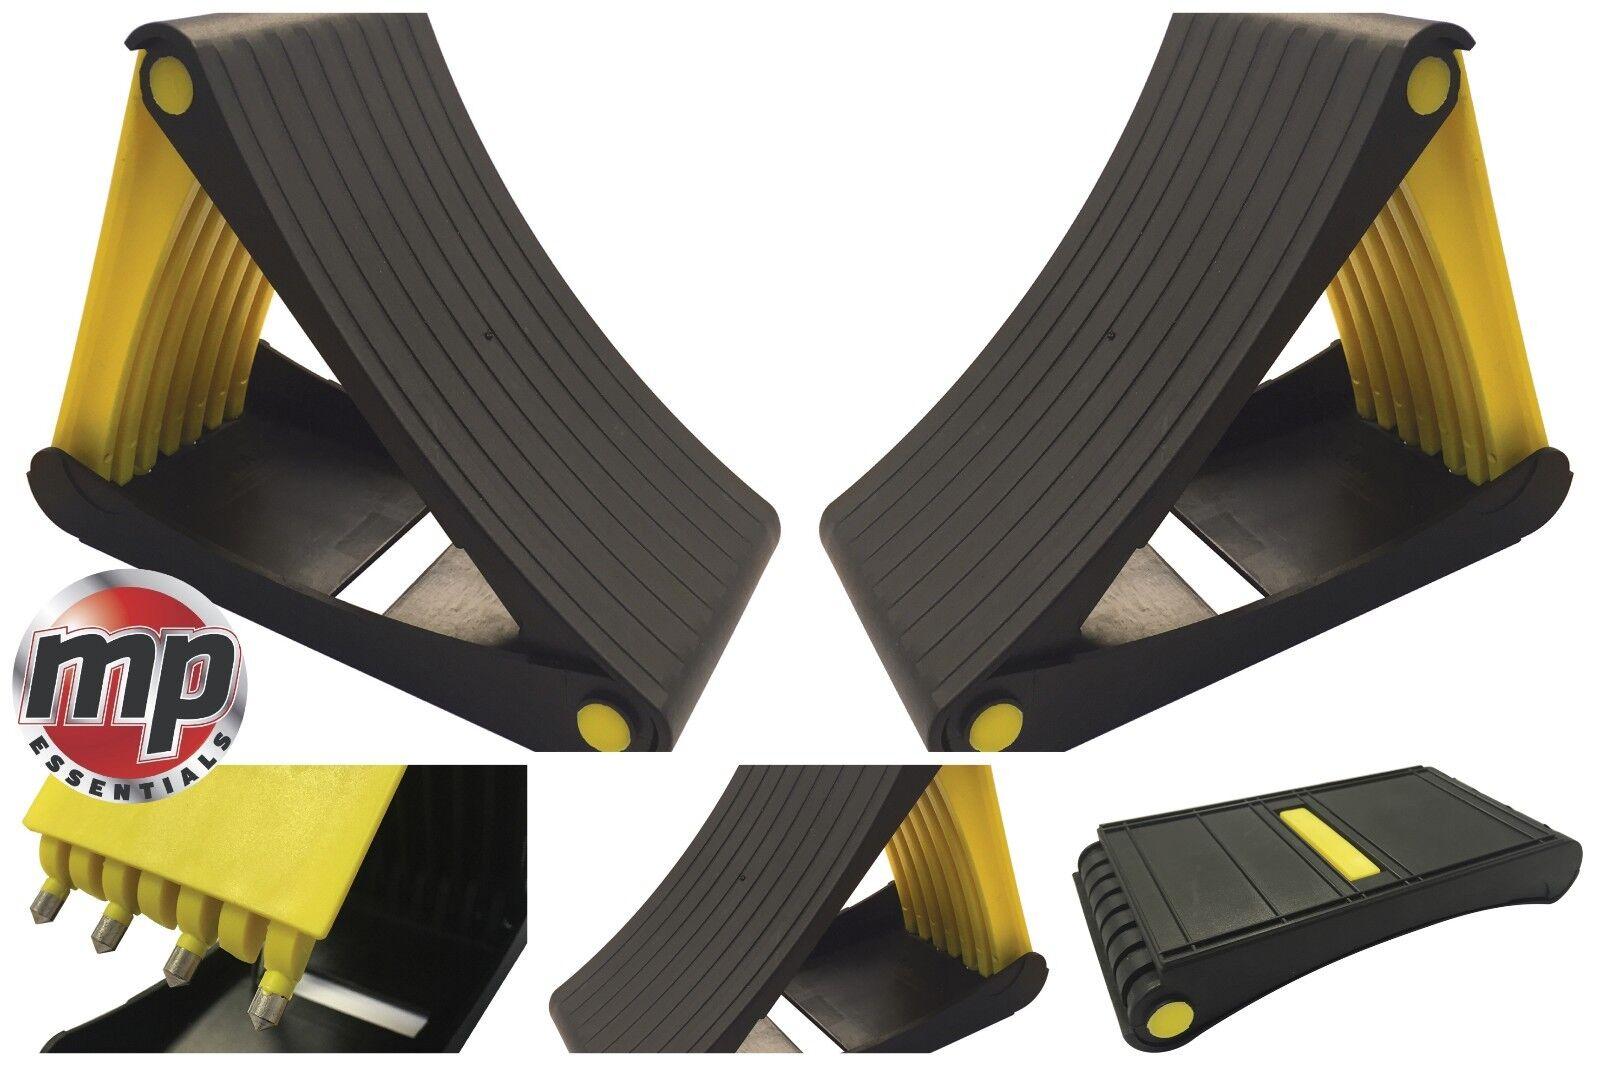 2 x Leisurewize Foldable Caravan Motorhome Car Trailer Wheel Chocks with Spikes